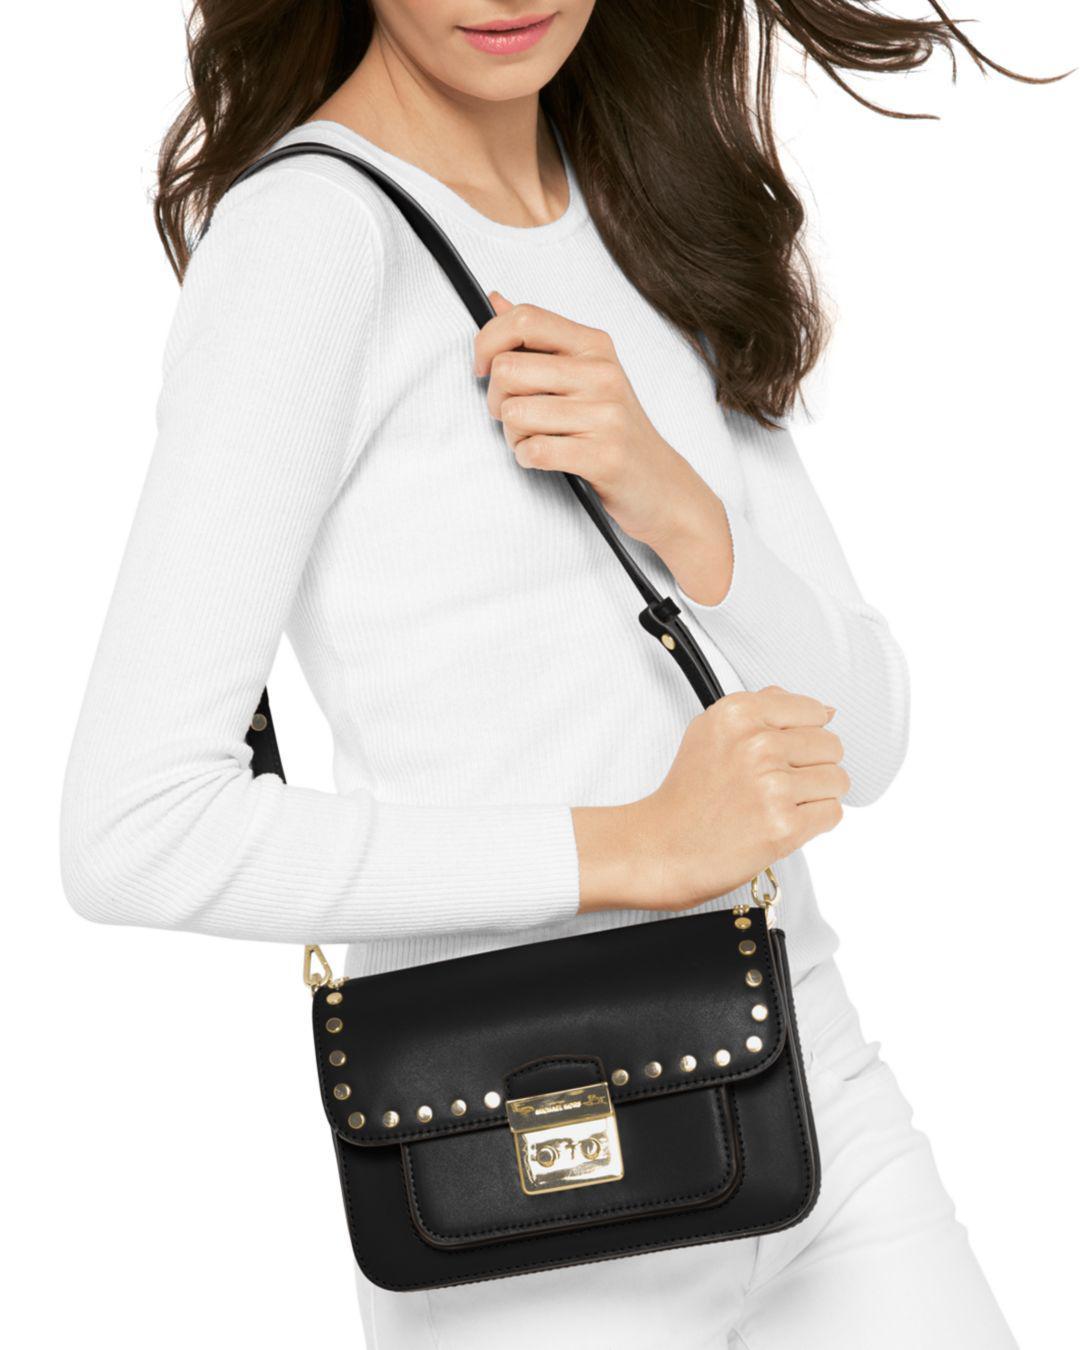 d766ded56f MICHAEL Michael Kors Sloan Editor Studded Large Leather Shoulder Bag in  Brown - Lyst